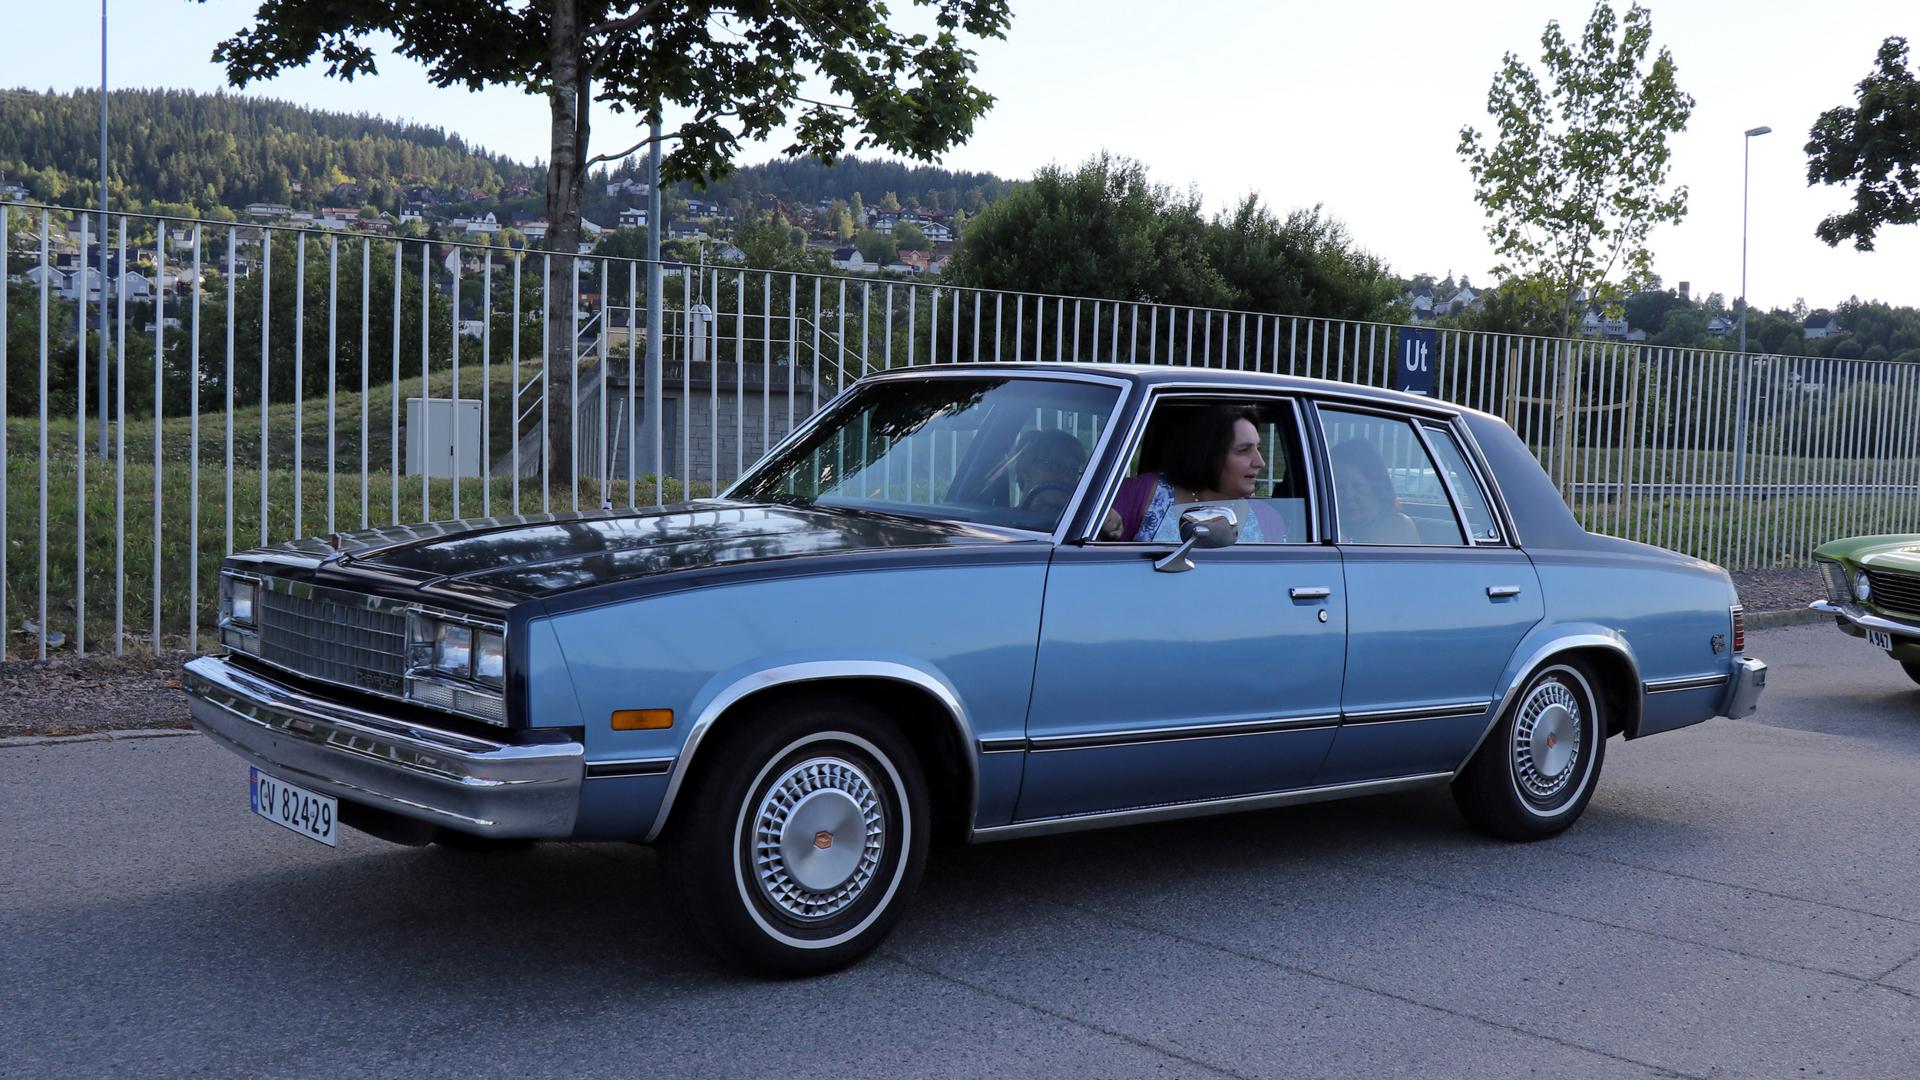 062-1982 Chevrolet Malibu Classic 02, Eier- 062 Ed